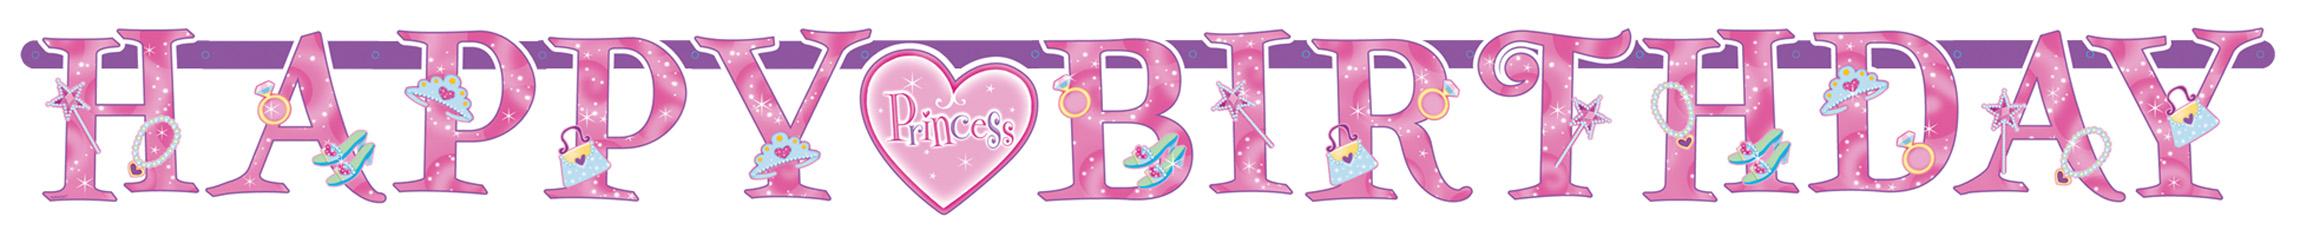 Banner Princess HB